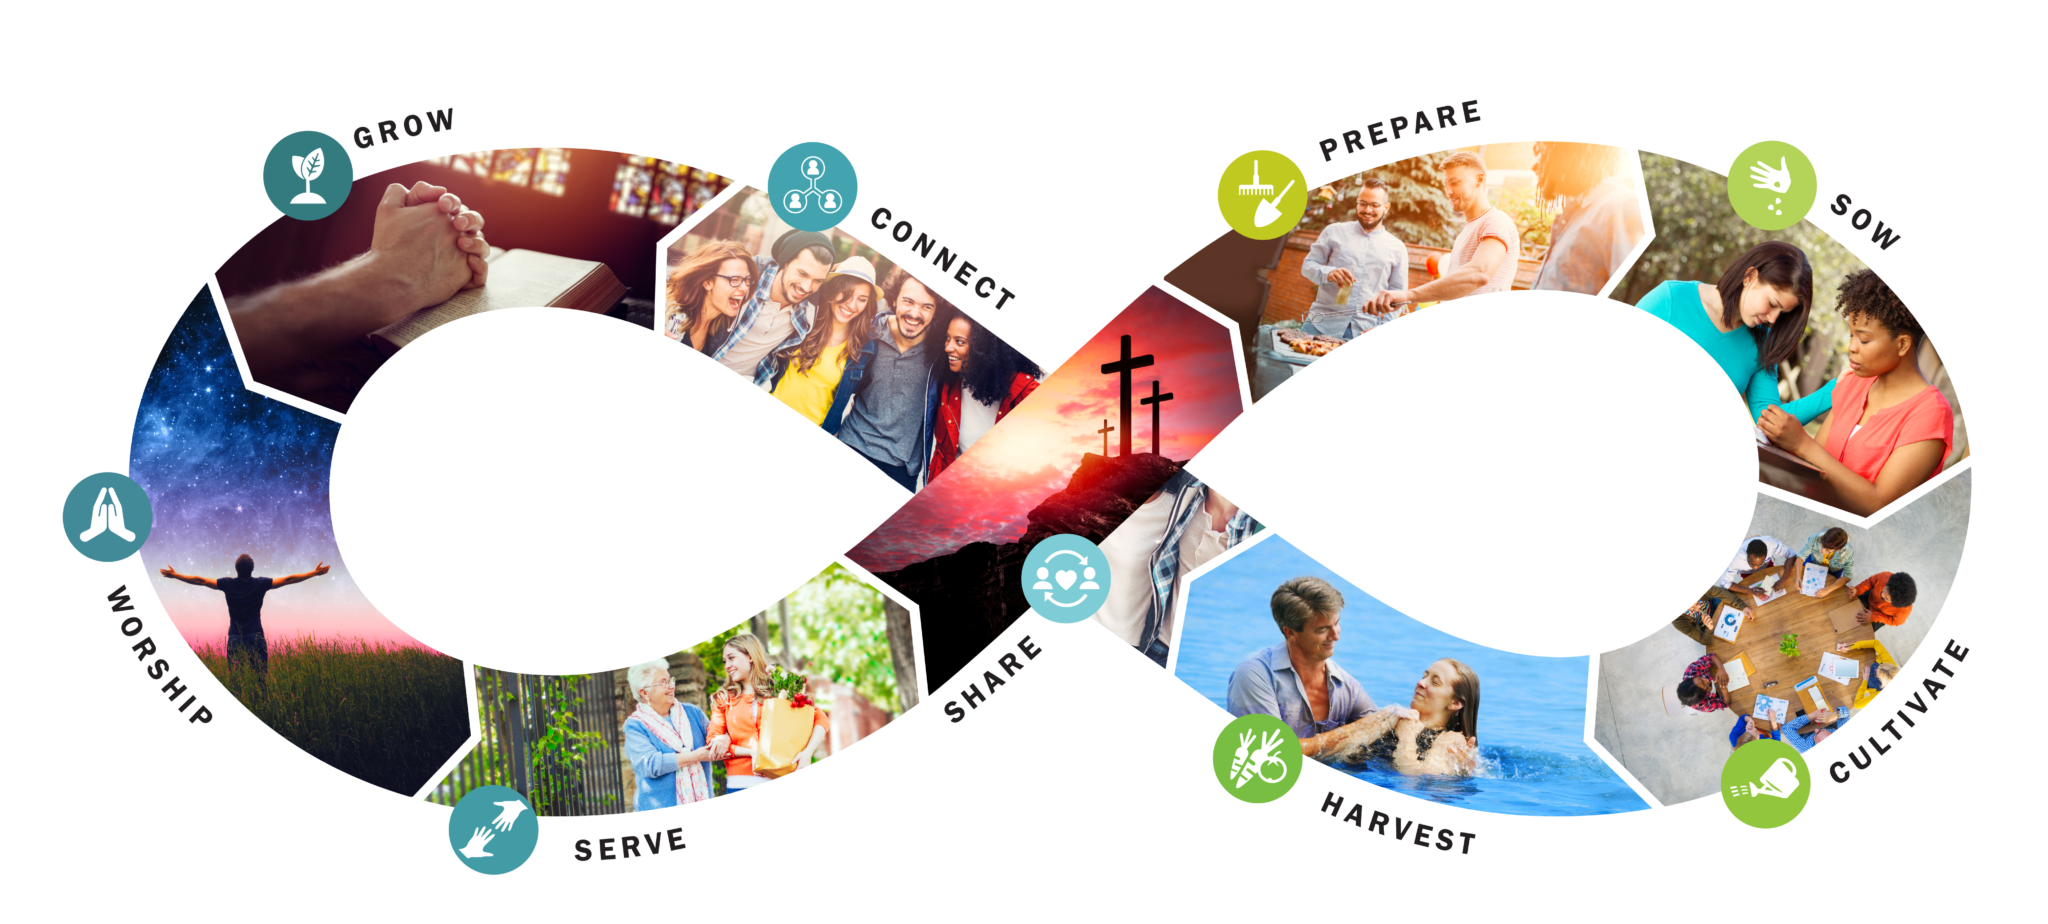 DiscipleshipJourney Original HR Image-Title-Icon